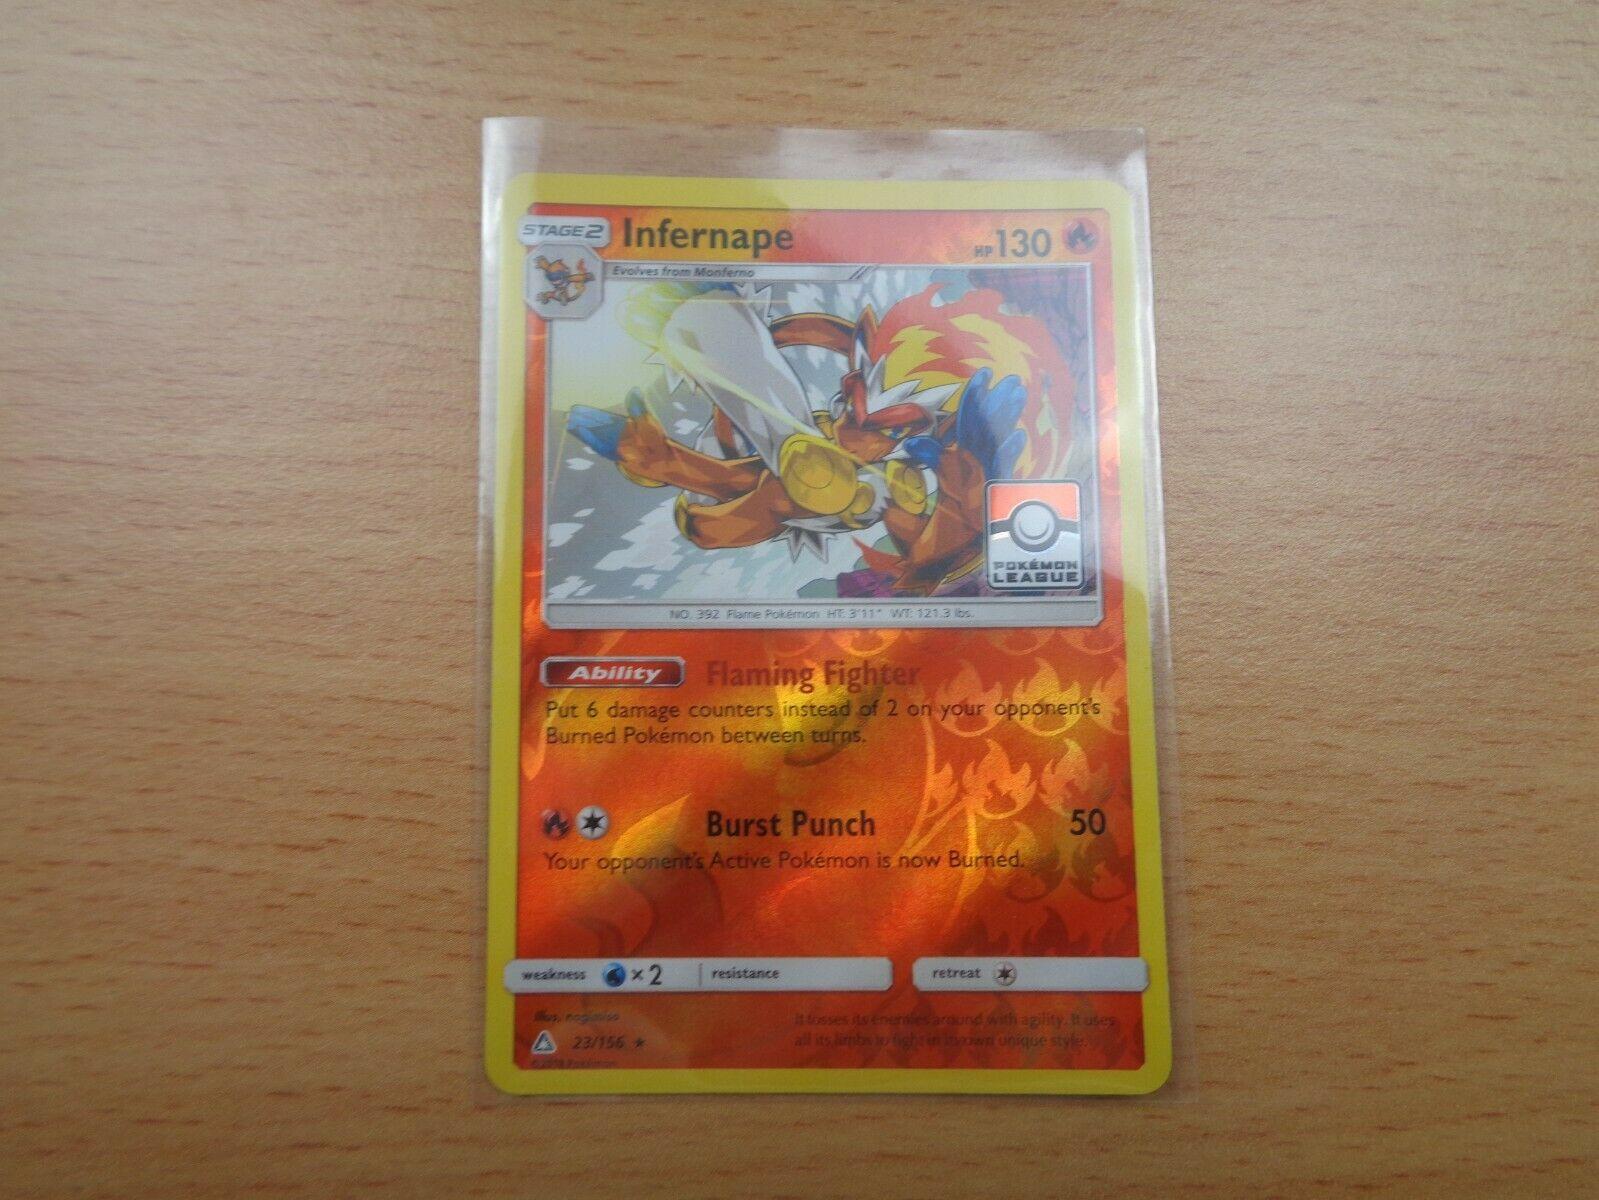 Infernape (23/156) RARE REVERSE HOLO POKEMON LEAGUE PROMO Card, Ultra Prism - Image 3